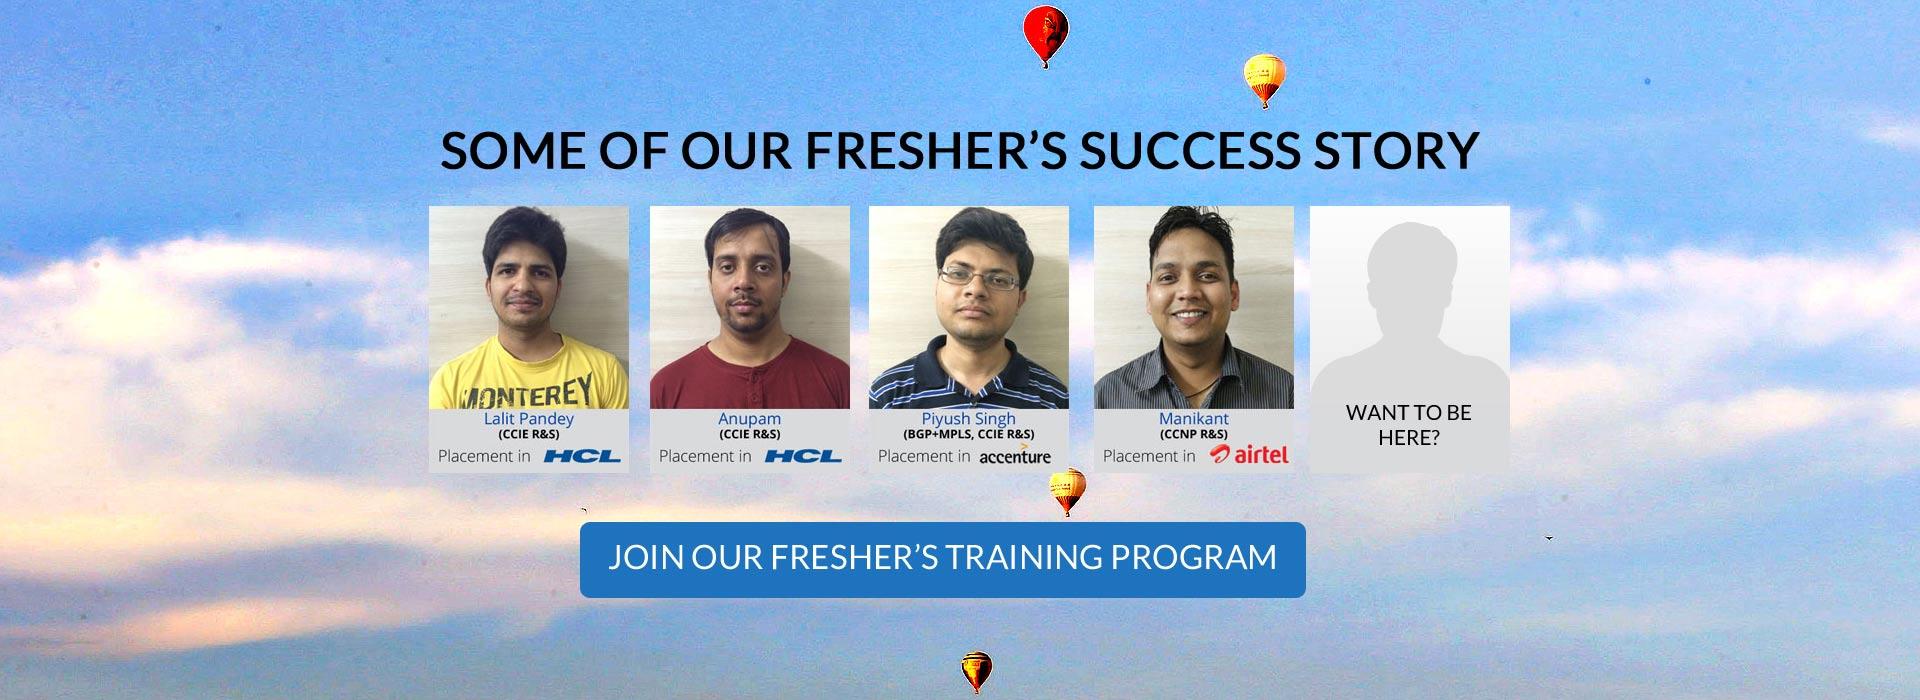 Fresher's Training Program